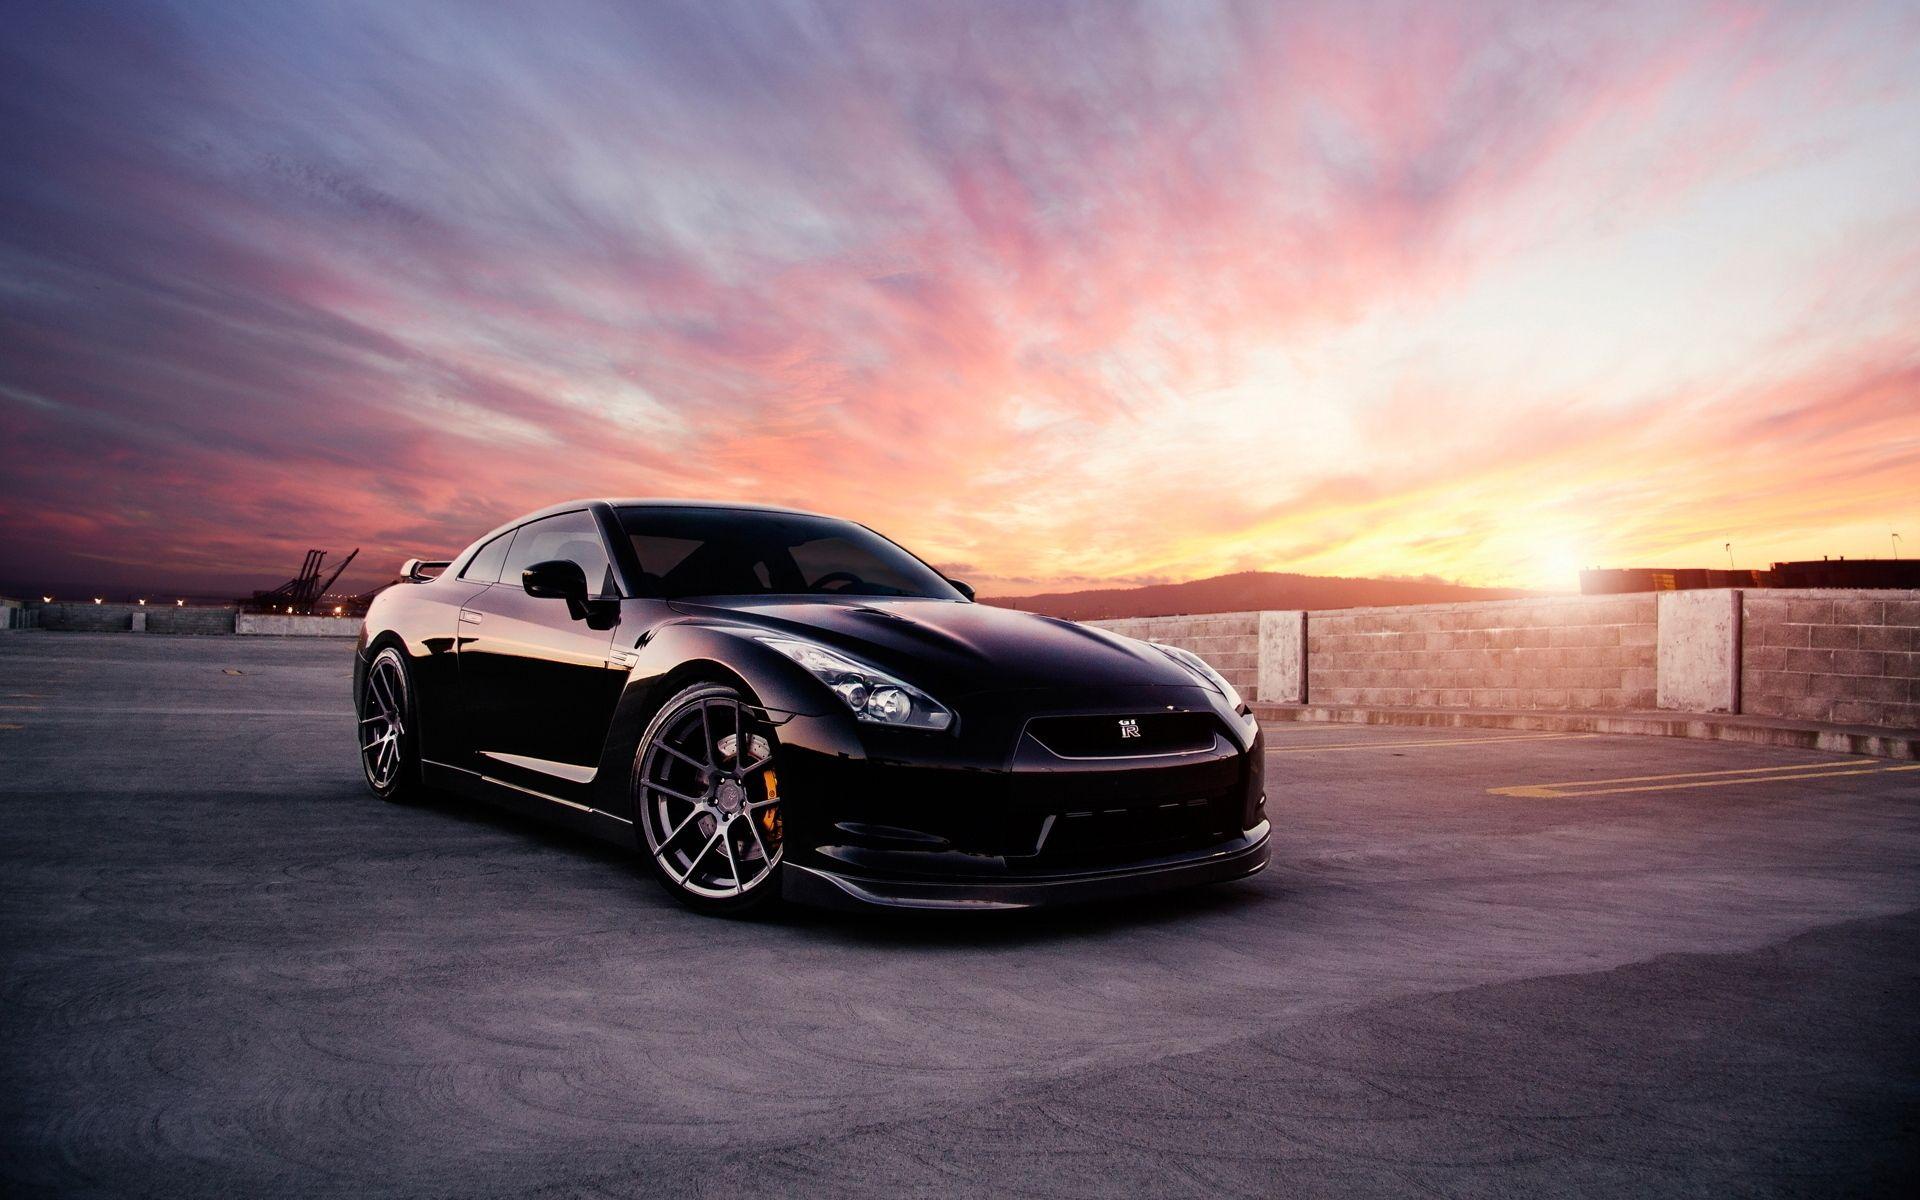 Images Download Black Nissan Gtr Wallpapers. Nissan gtr